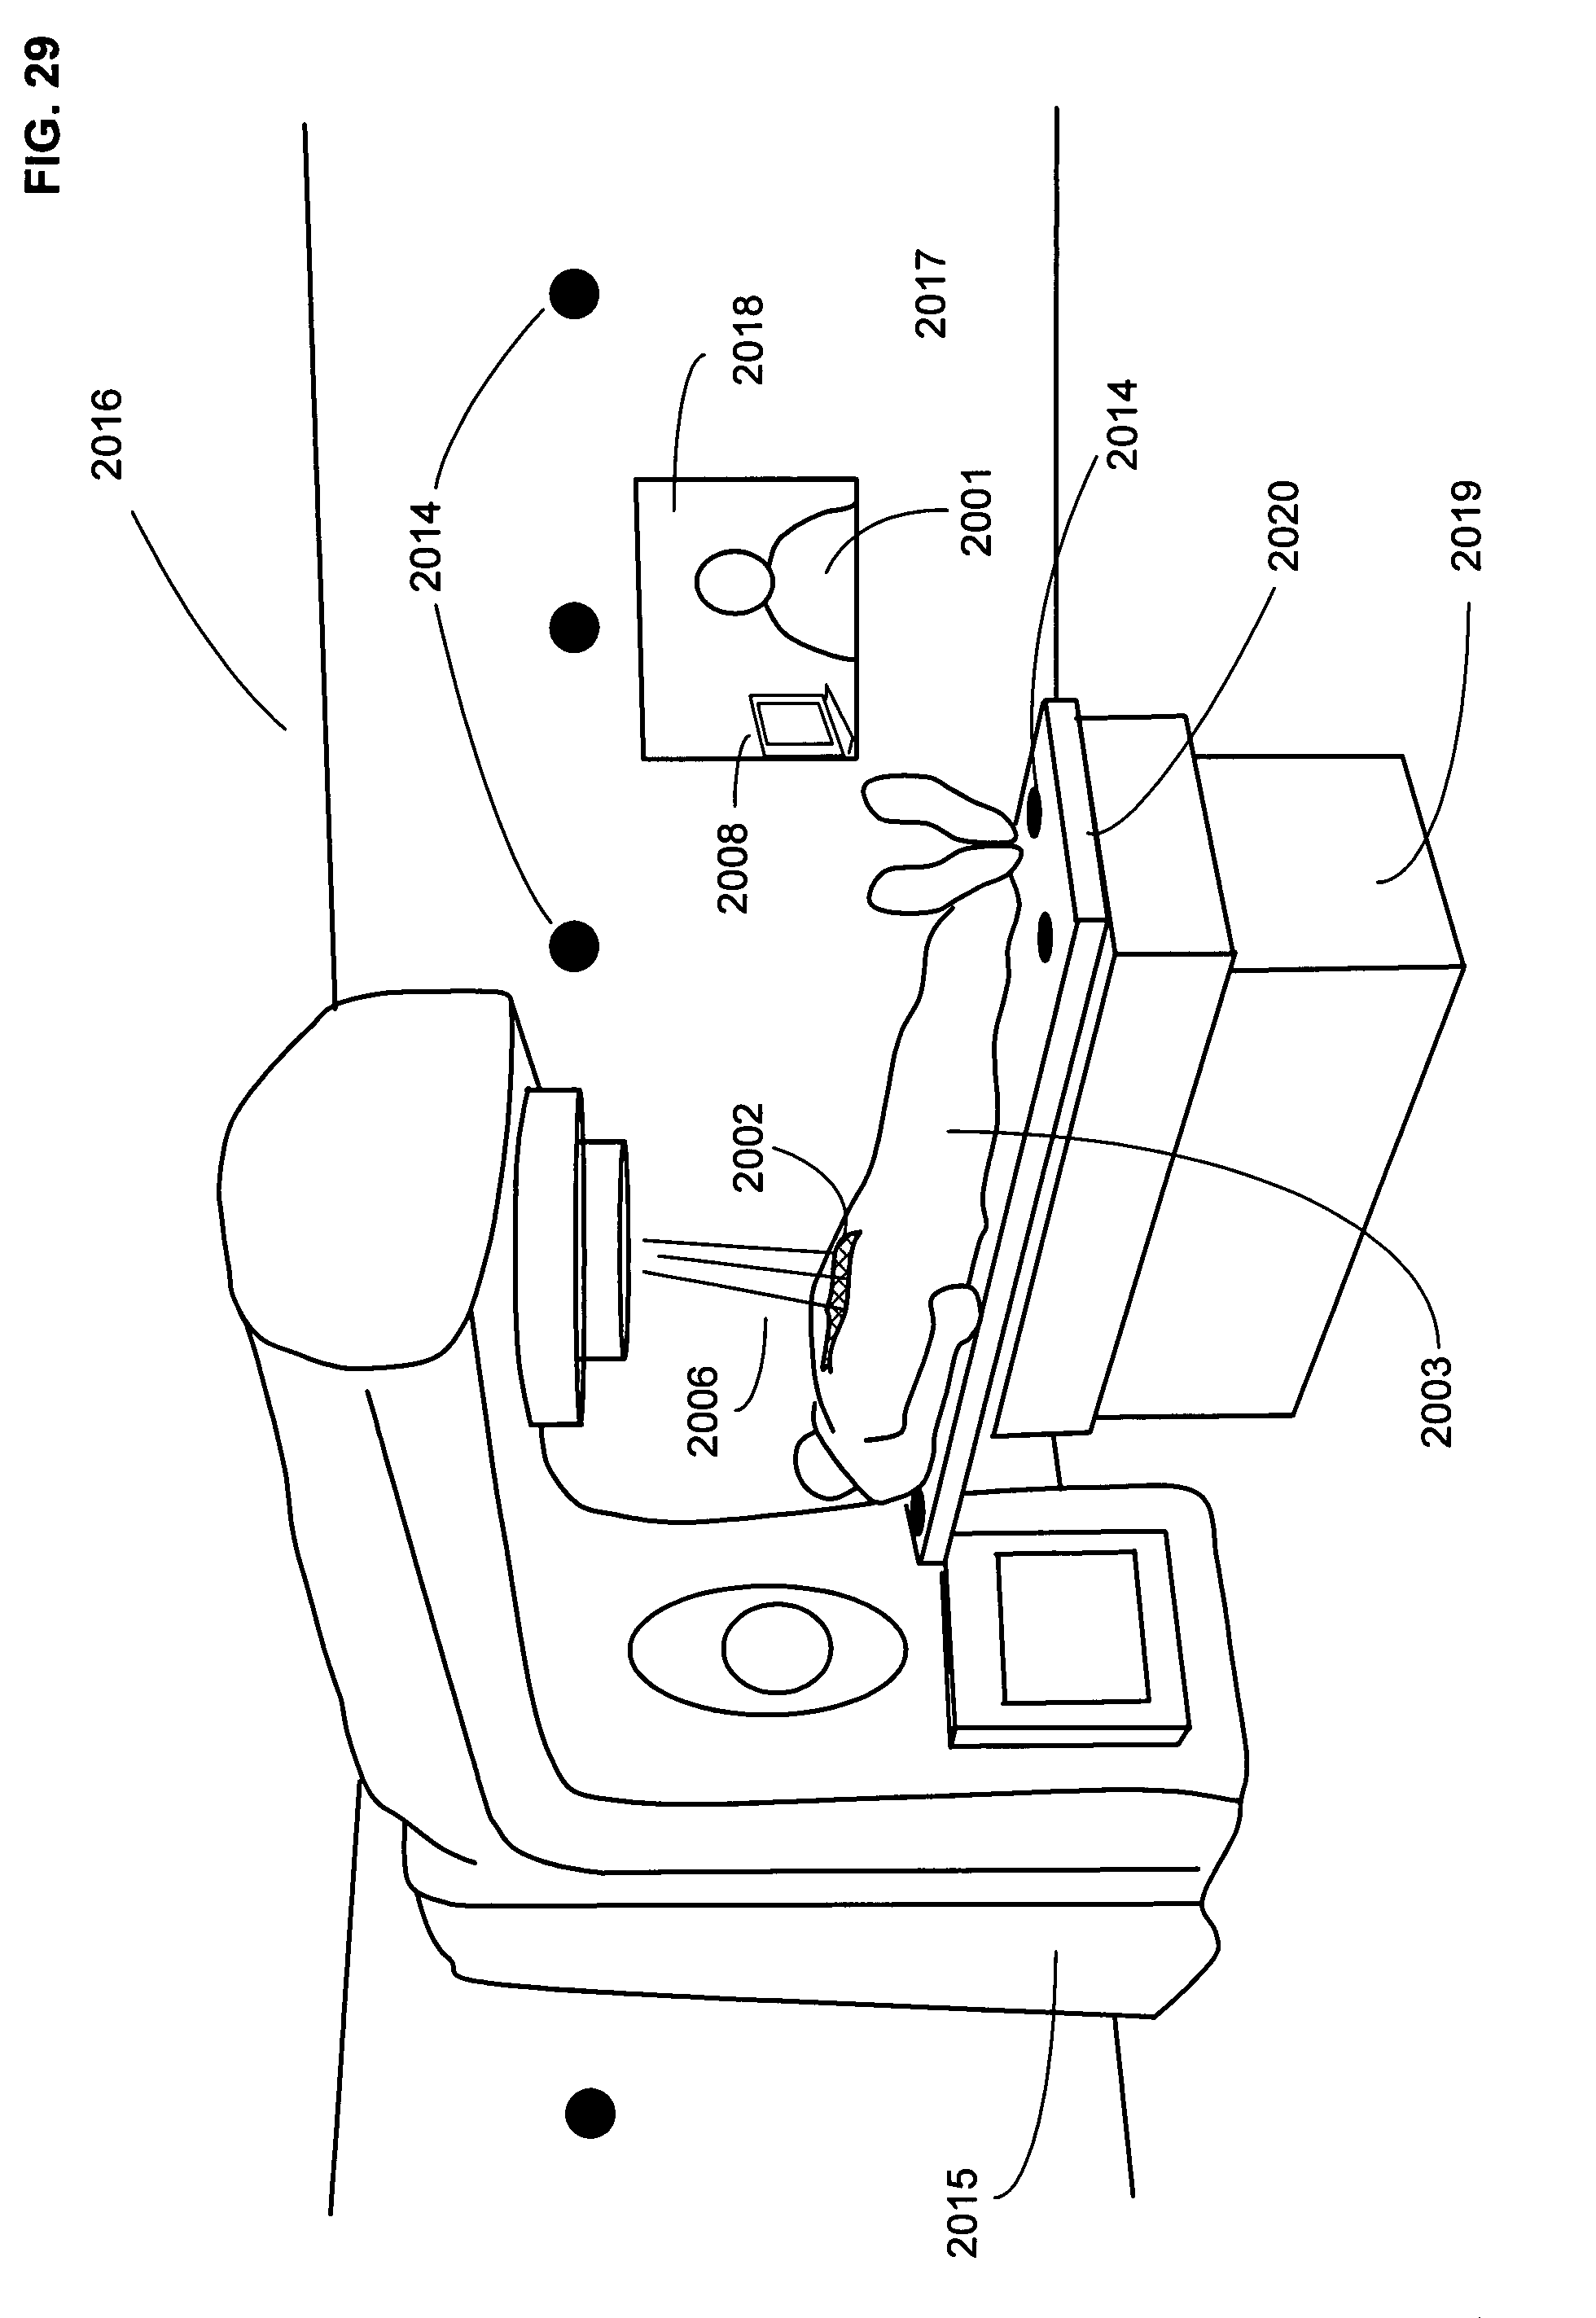 8113 96 Ford Ranger Spark Plug Wiring Diagram   Wiring Resources